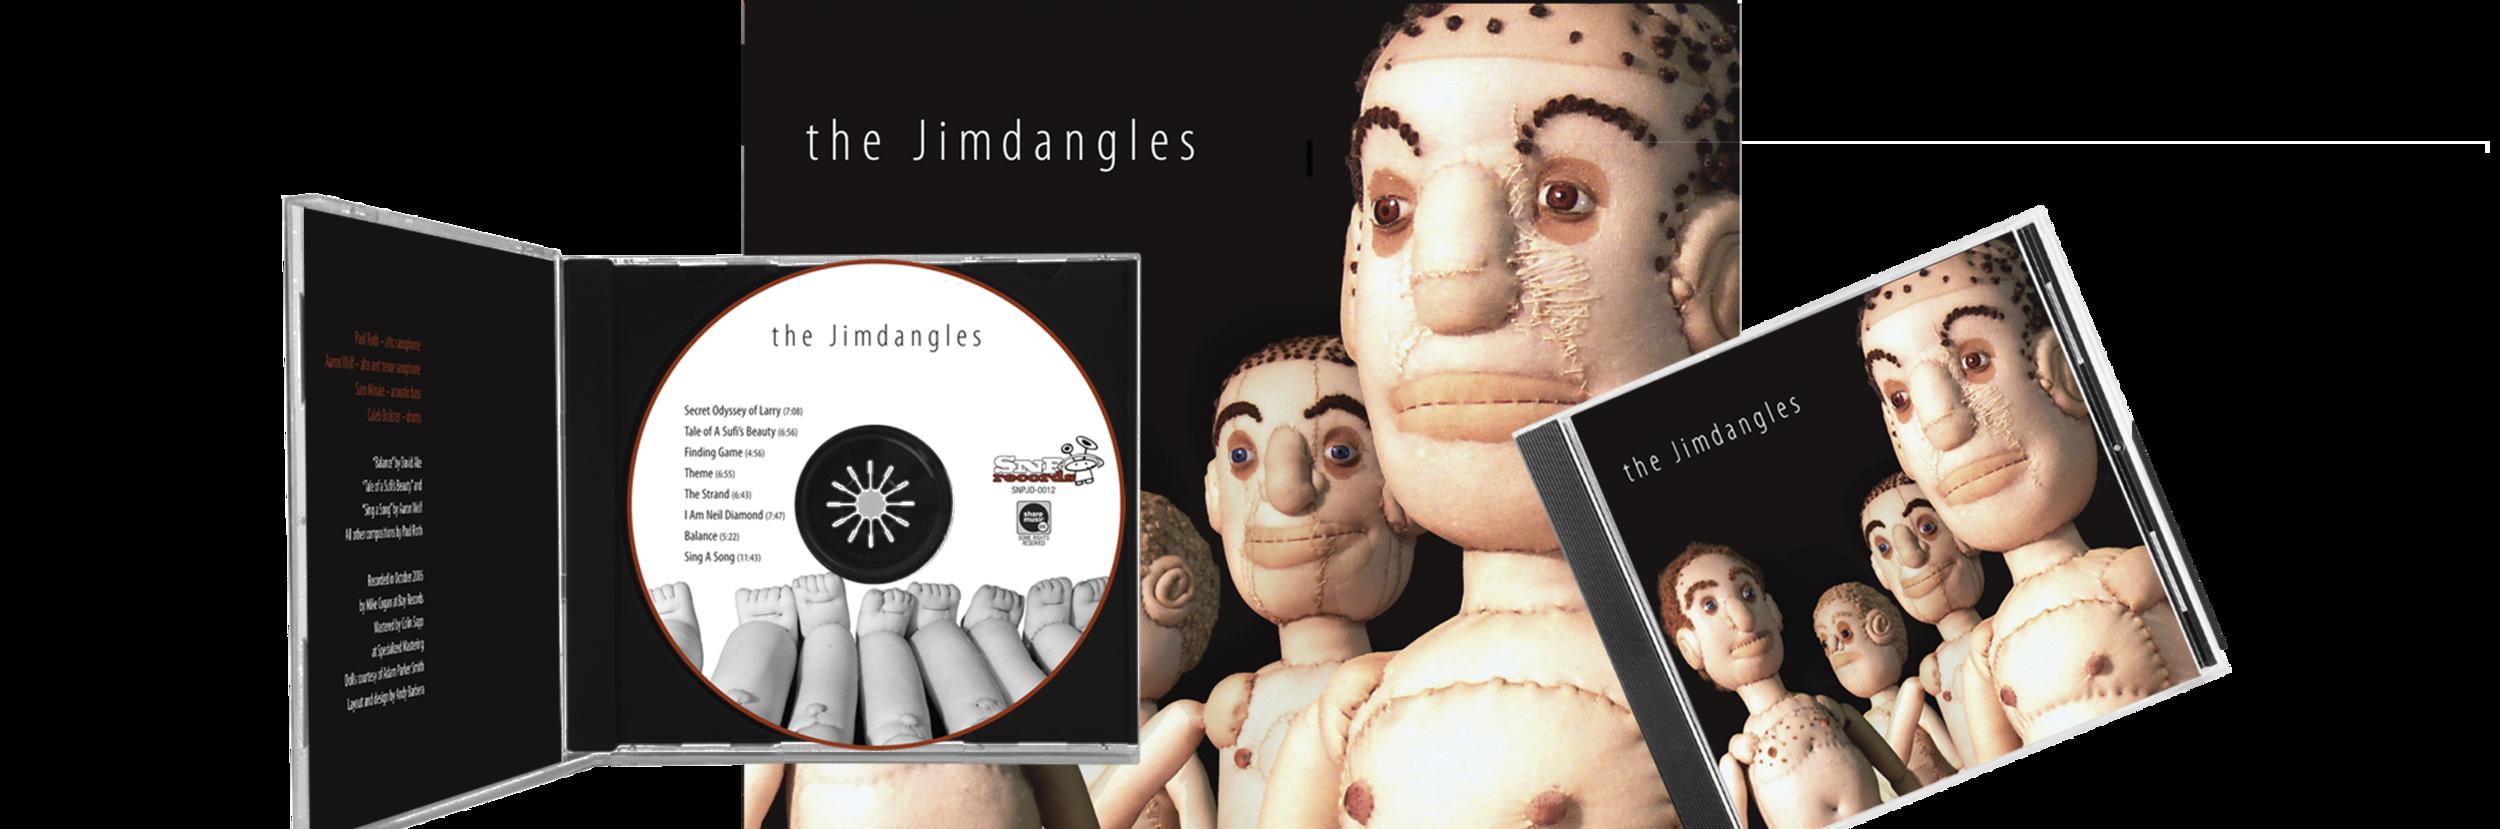 JimDangles disc layout 955.png